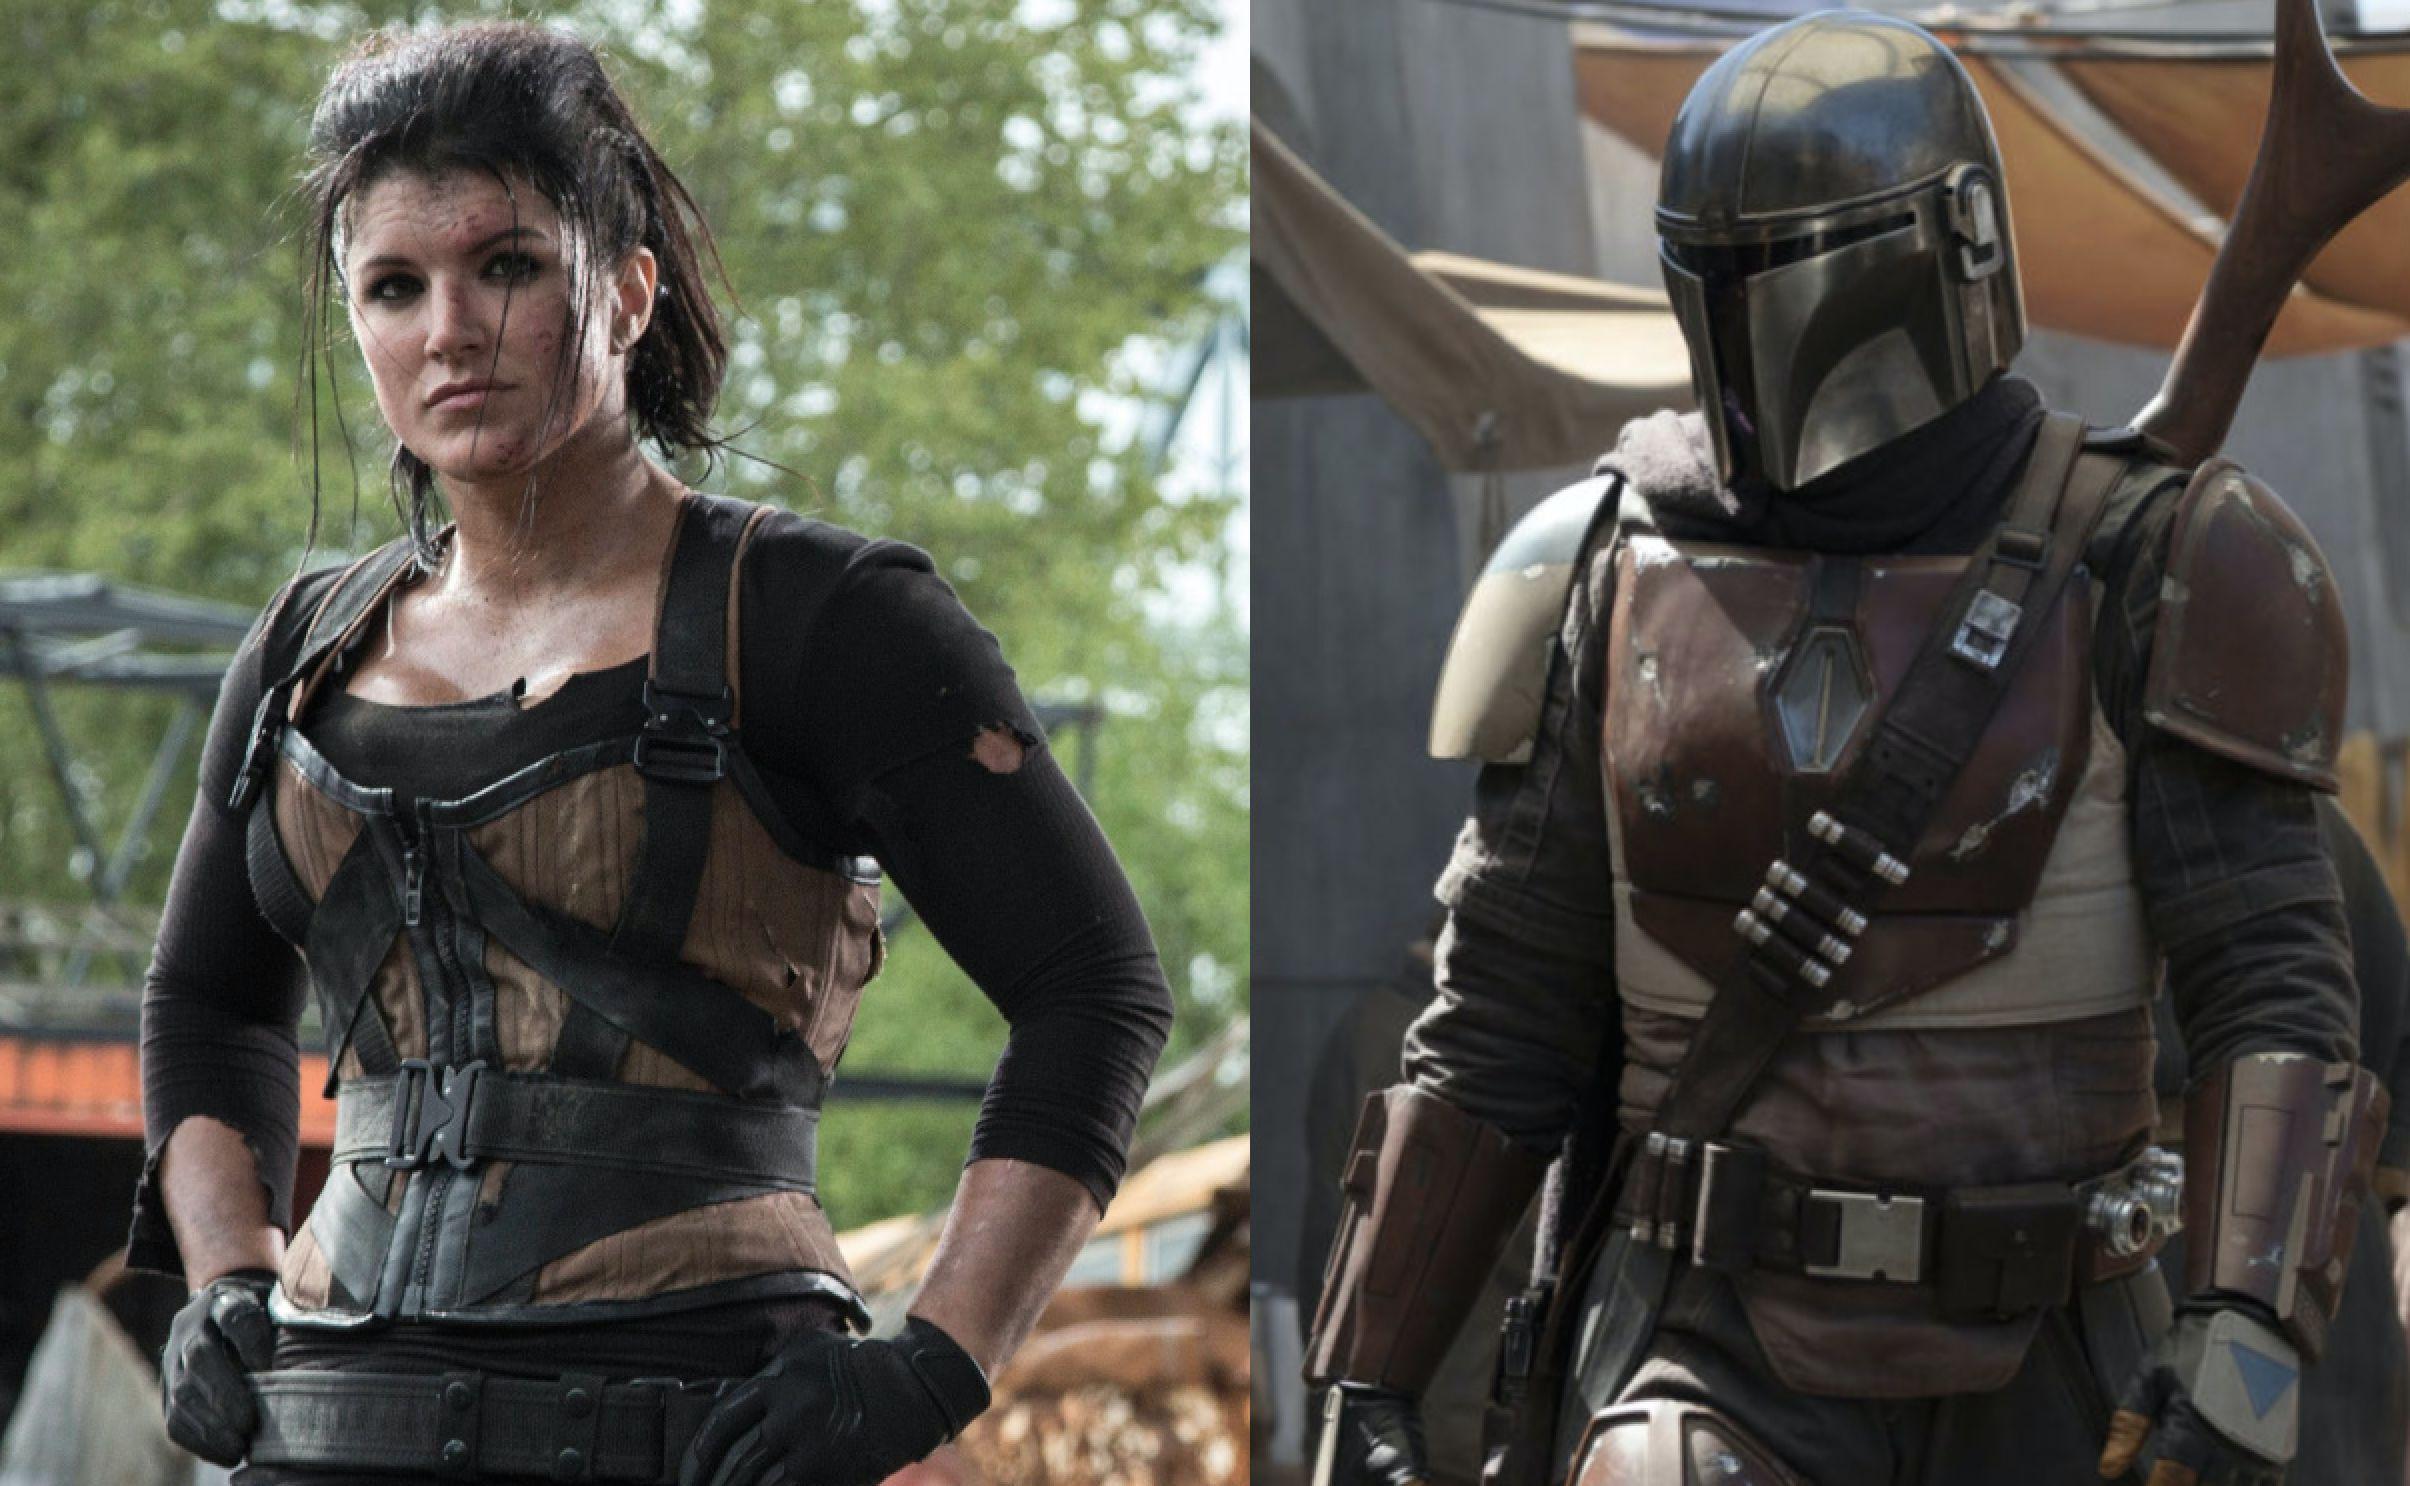 Deadpool star Gina Carano joins the cast of Disney's The Mandalorian